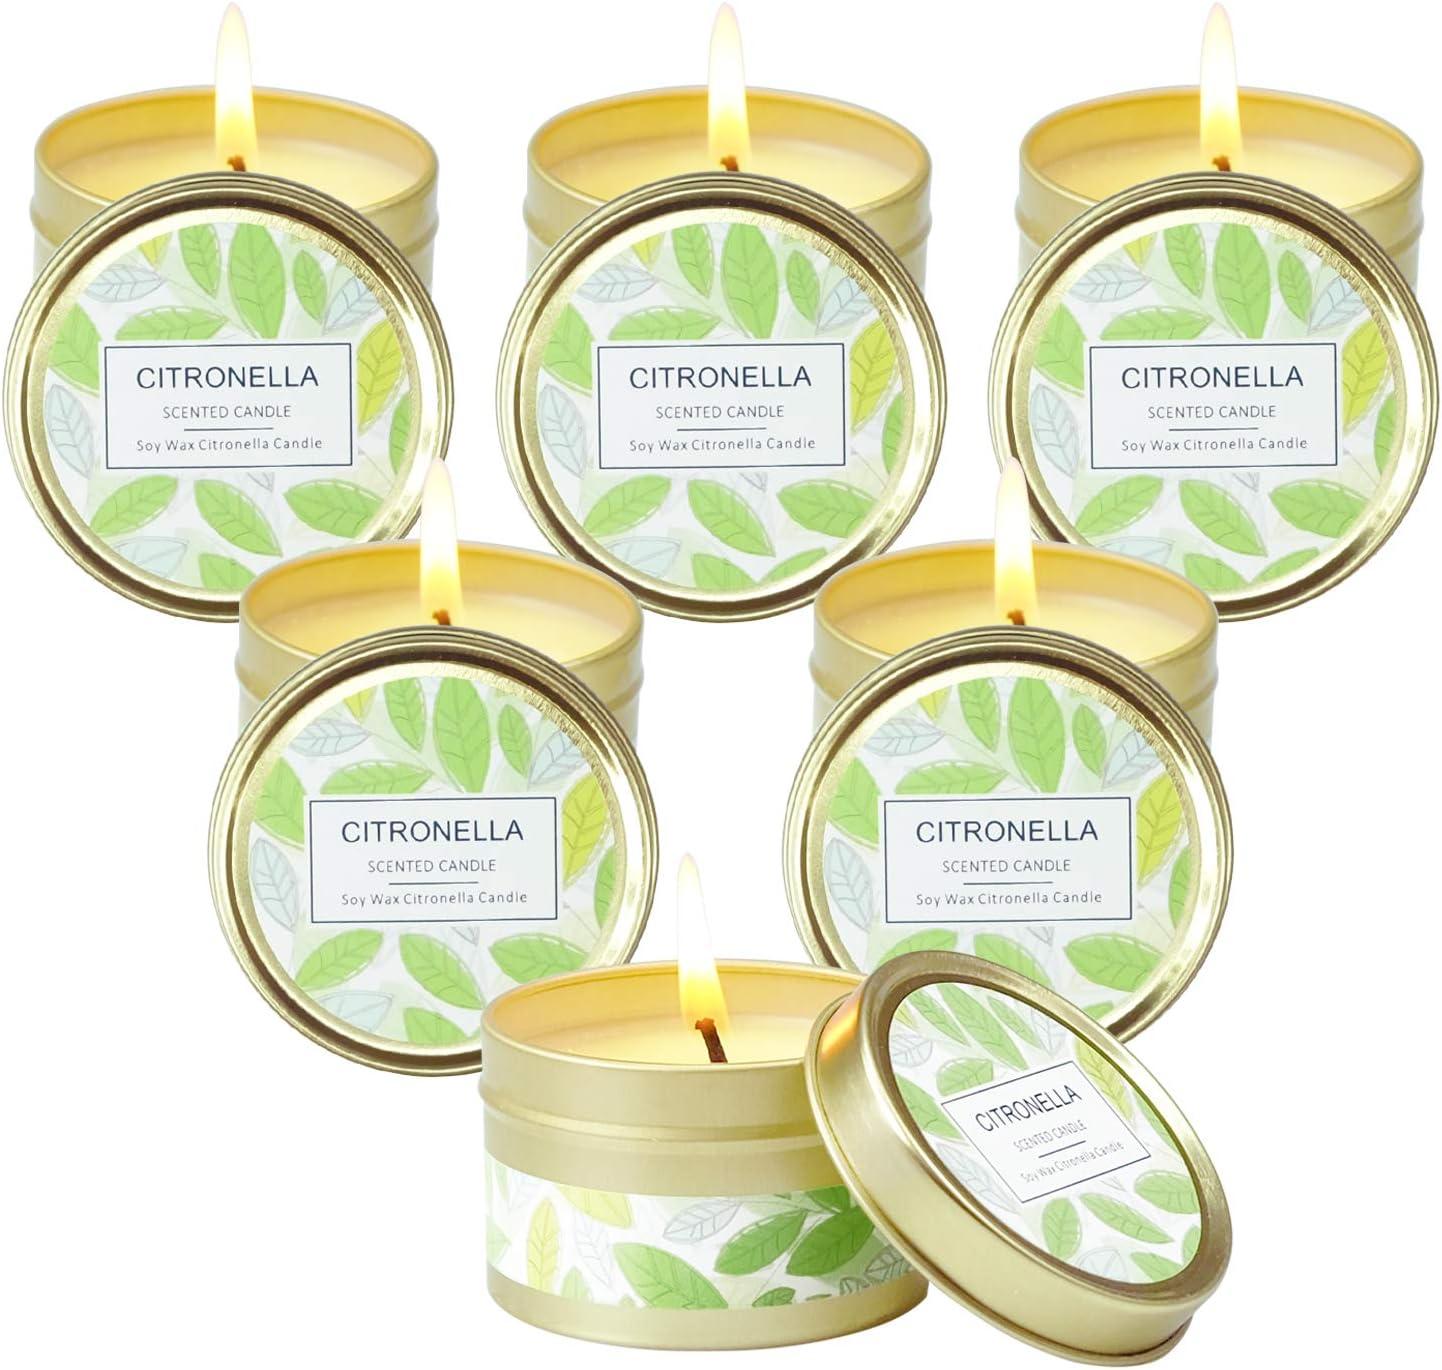 SCENTORINI Velas de Citronela en Lata Antimosquitos Ceras de Hierba con Aroma de limón, 100% de Cera de Soja Aire Libre 95g 15h x 6